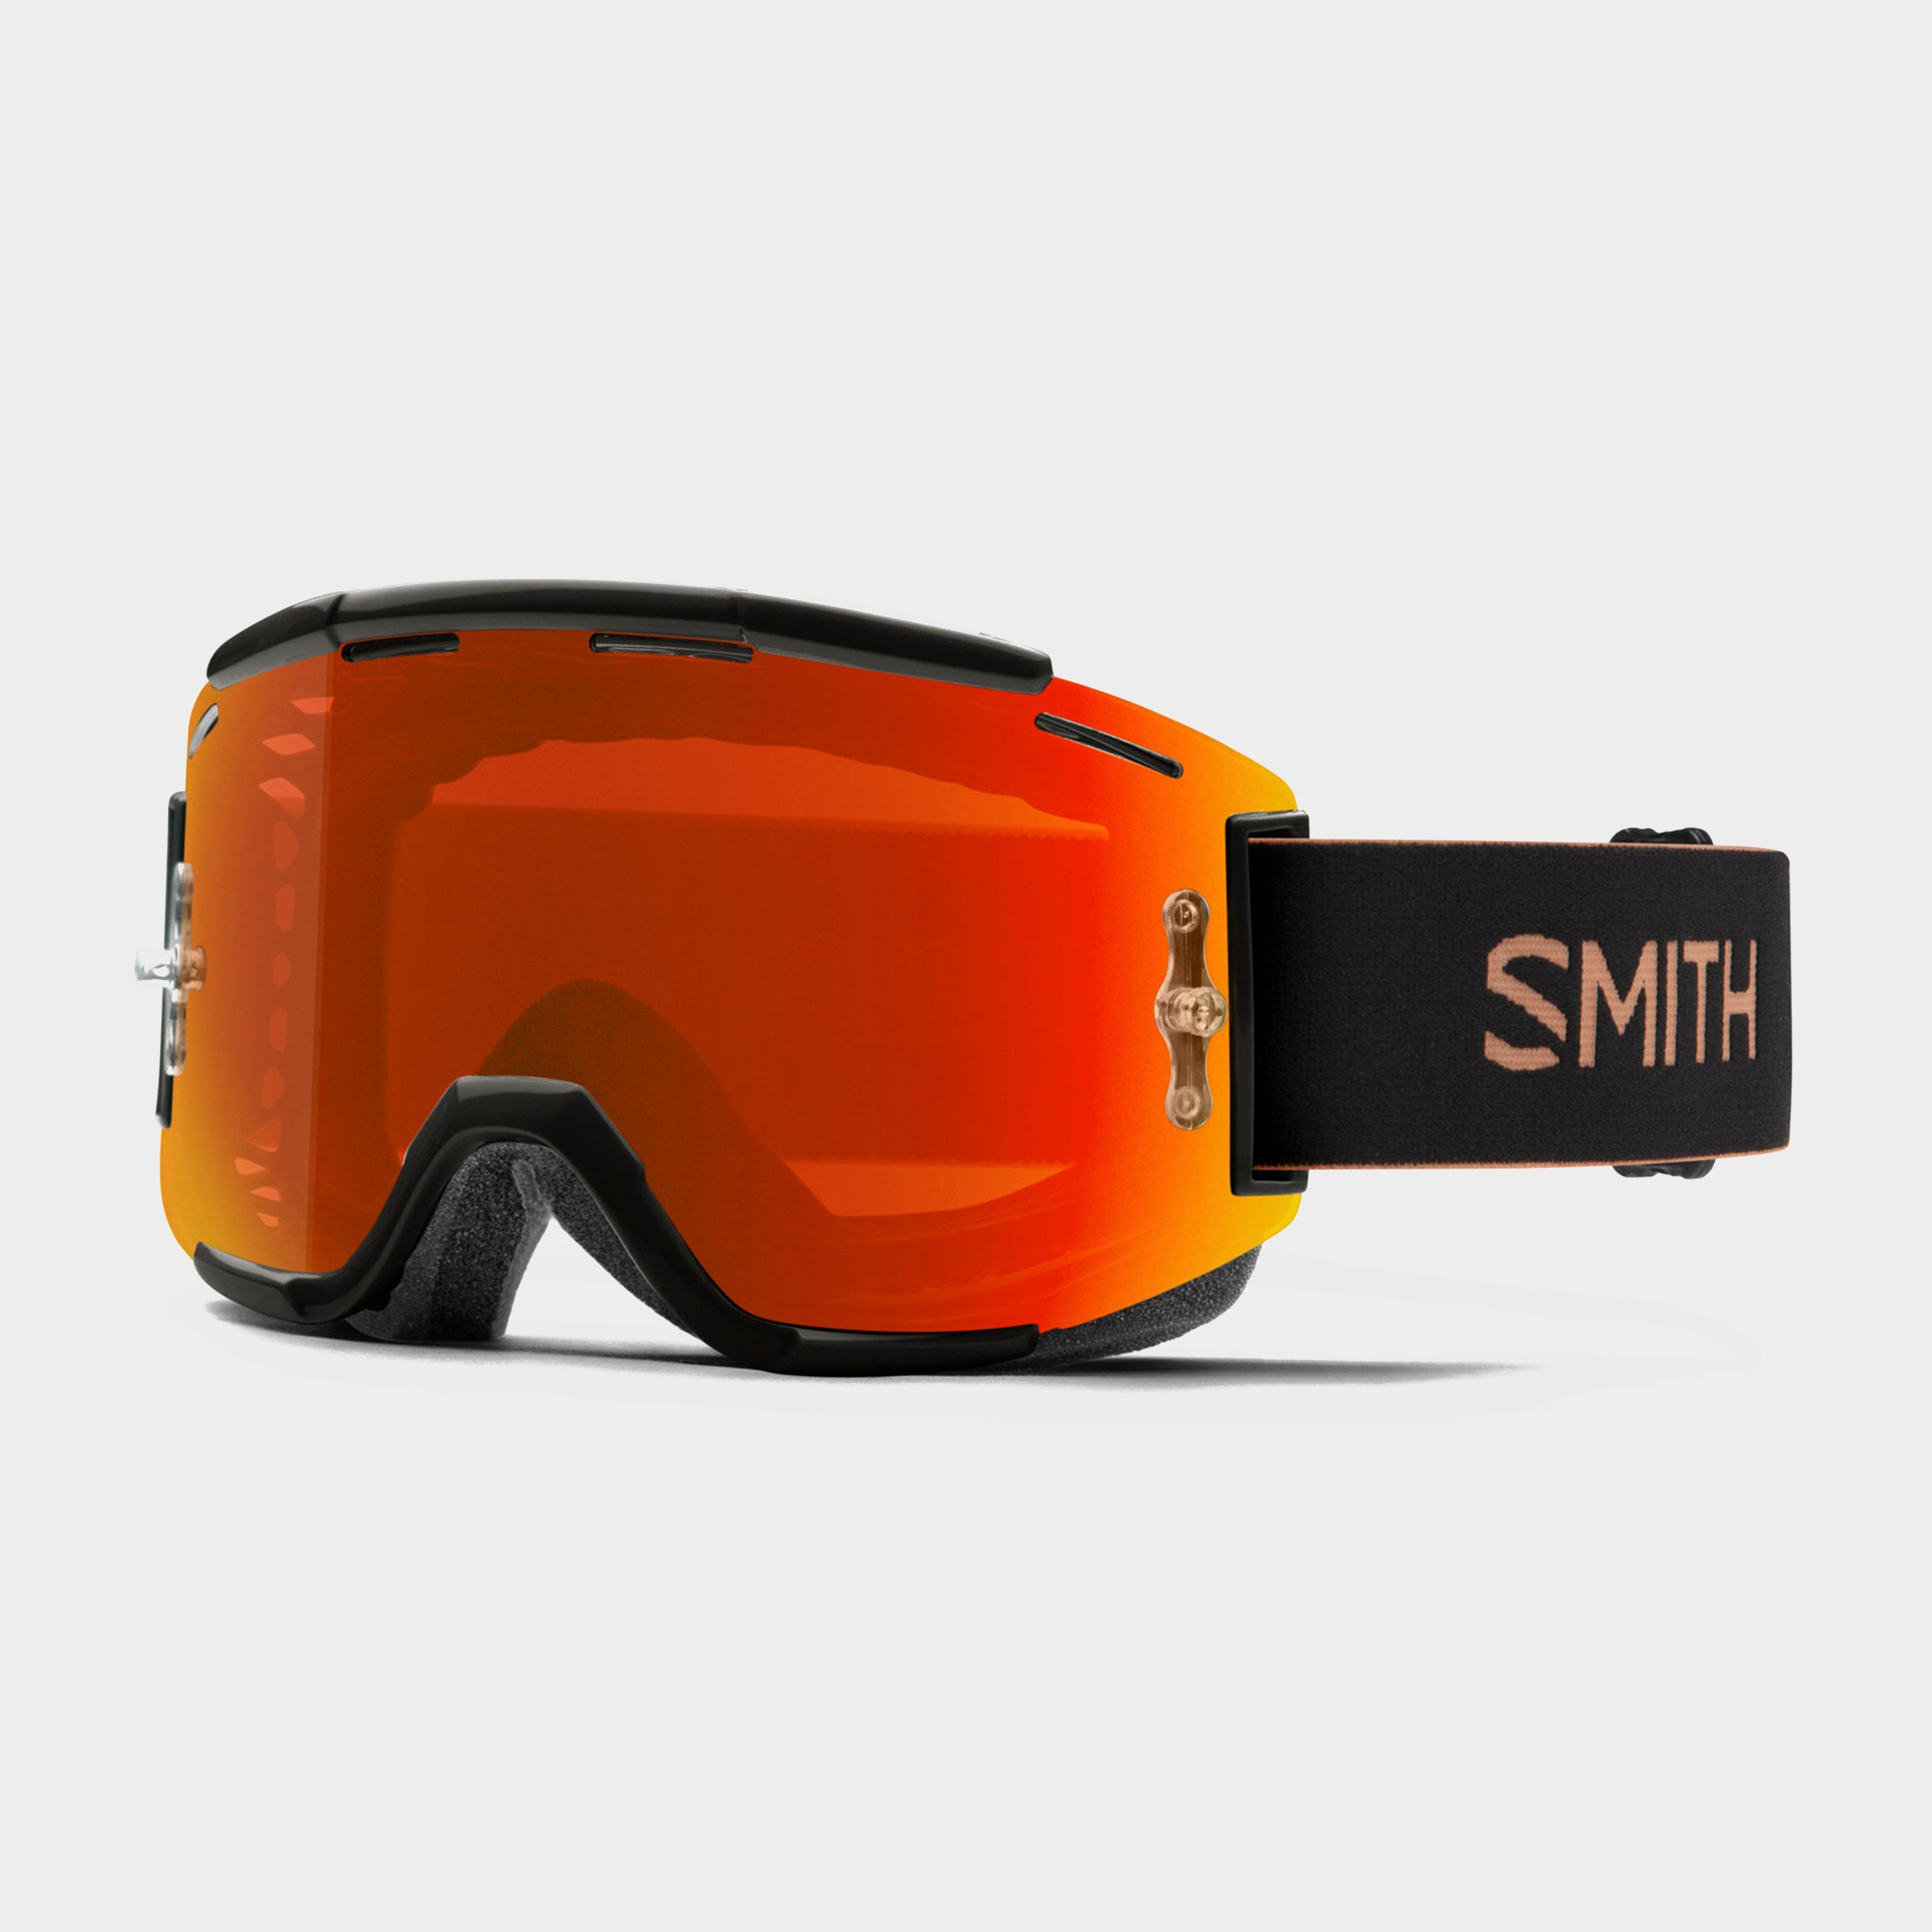 Clearance Clearance Squad MTB Goggles, Orange